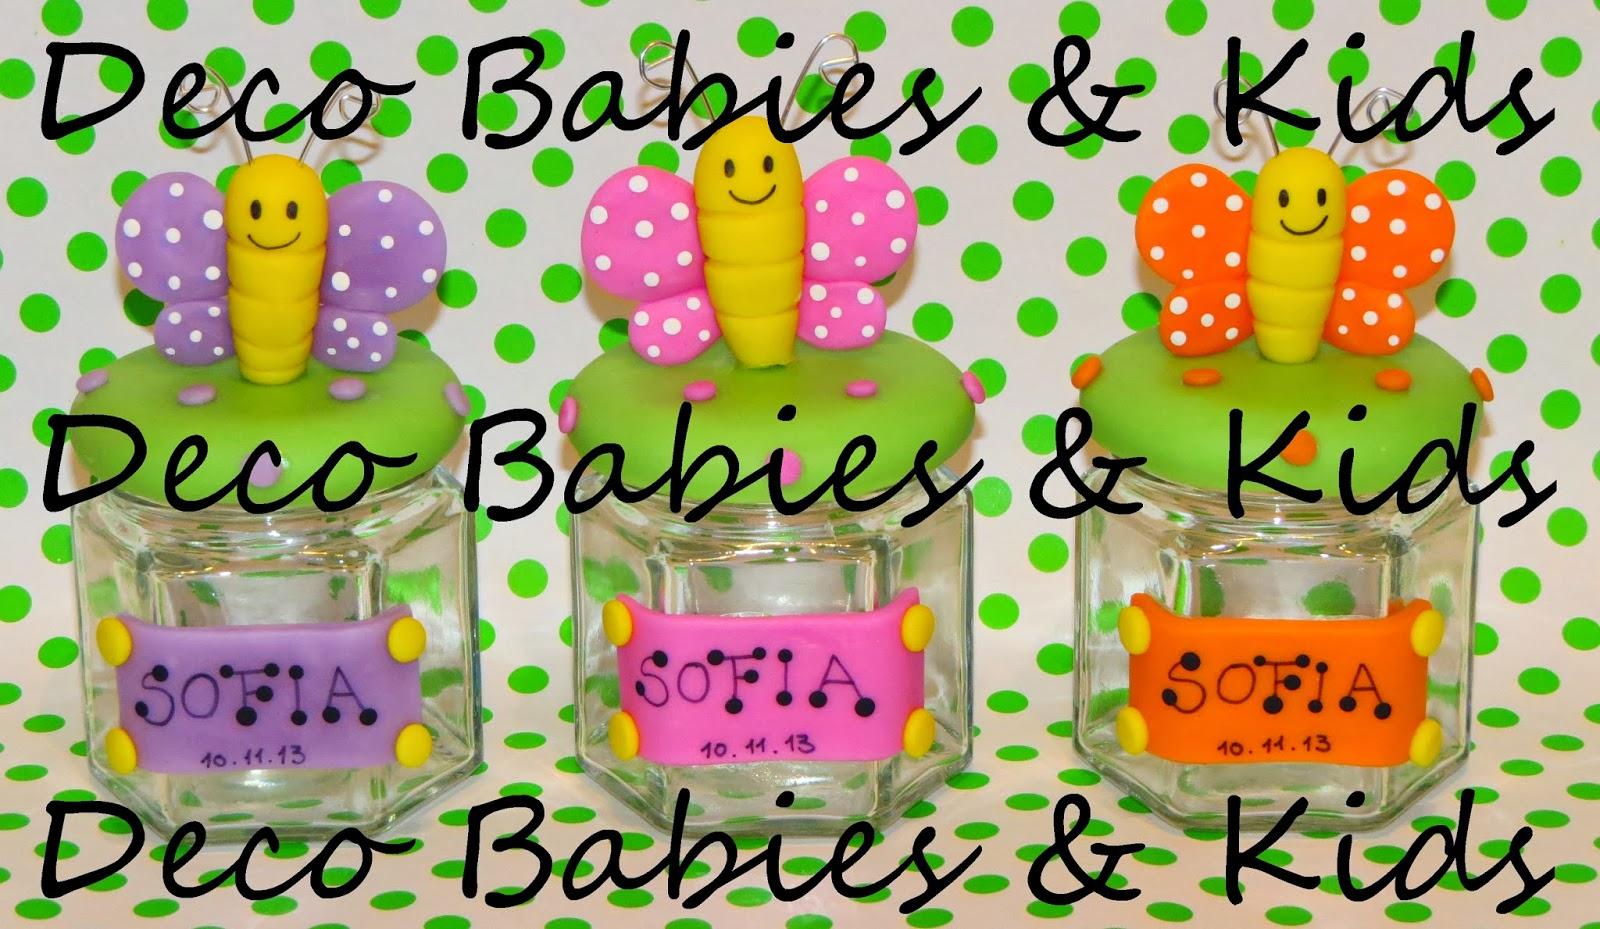 Deco Babies & Kids: 10-nov-2013